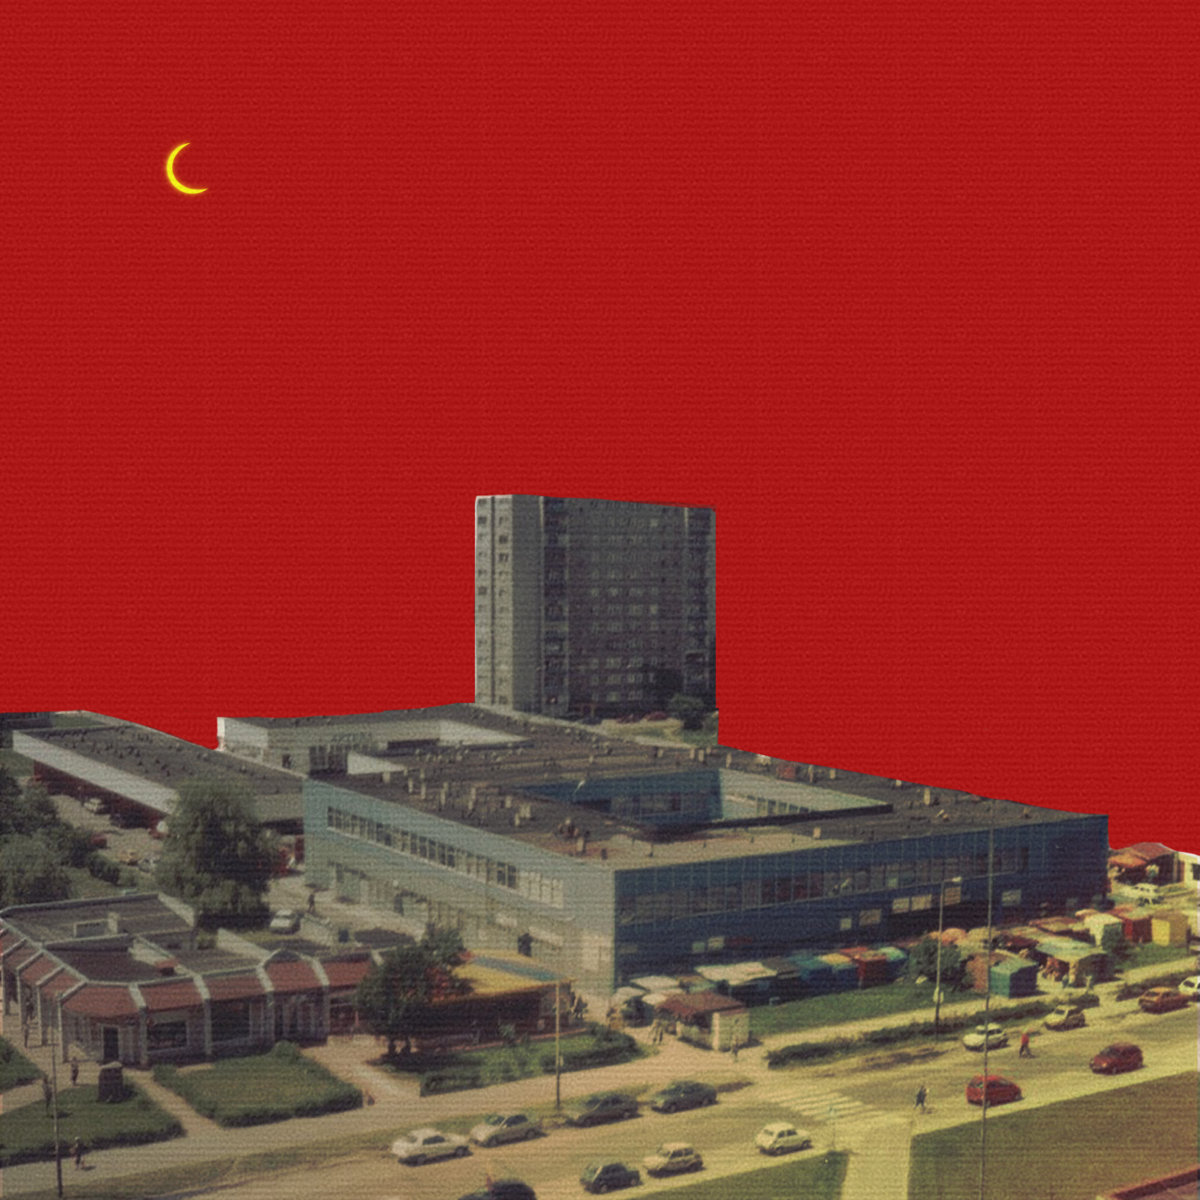 Blokowisko - Płonie (LP, 2020)